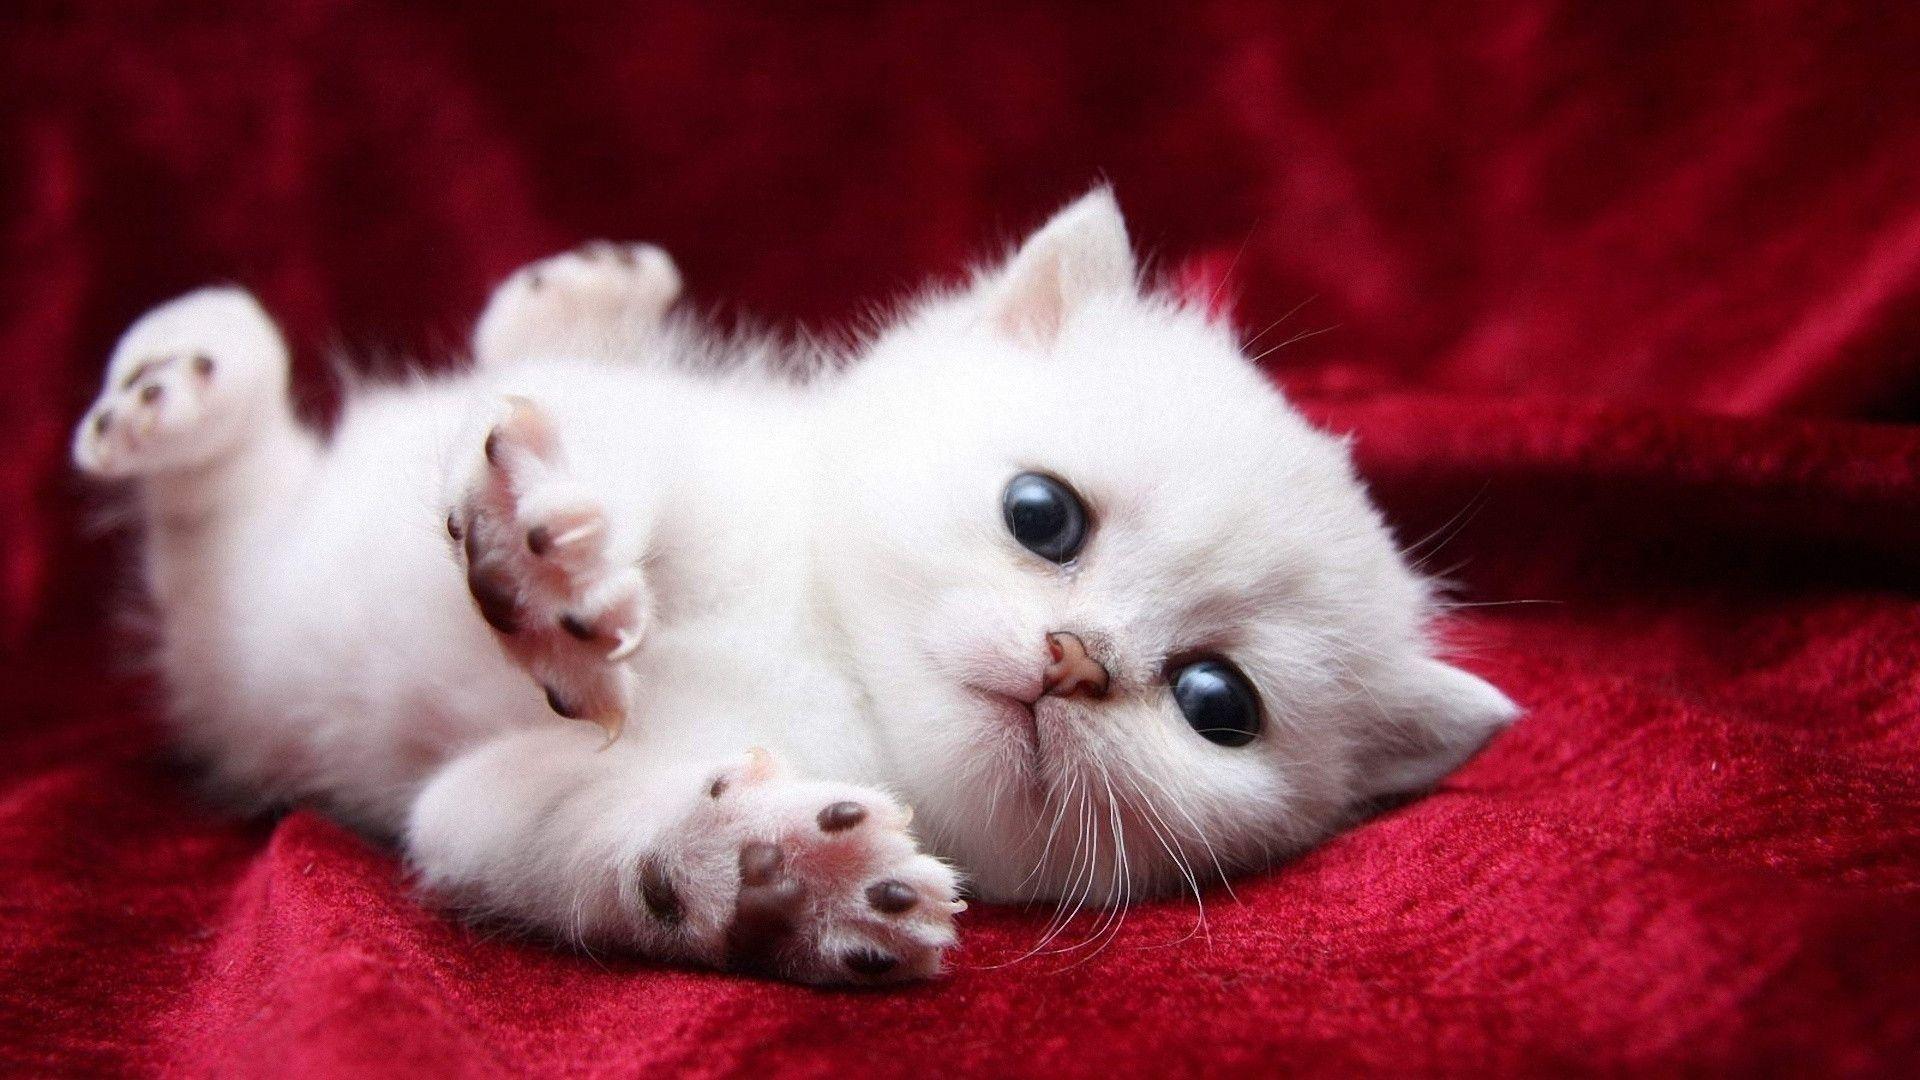 Res: 1920x1080, Wallpapers For > Baby Kitten Wallpaper